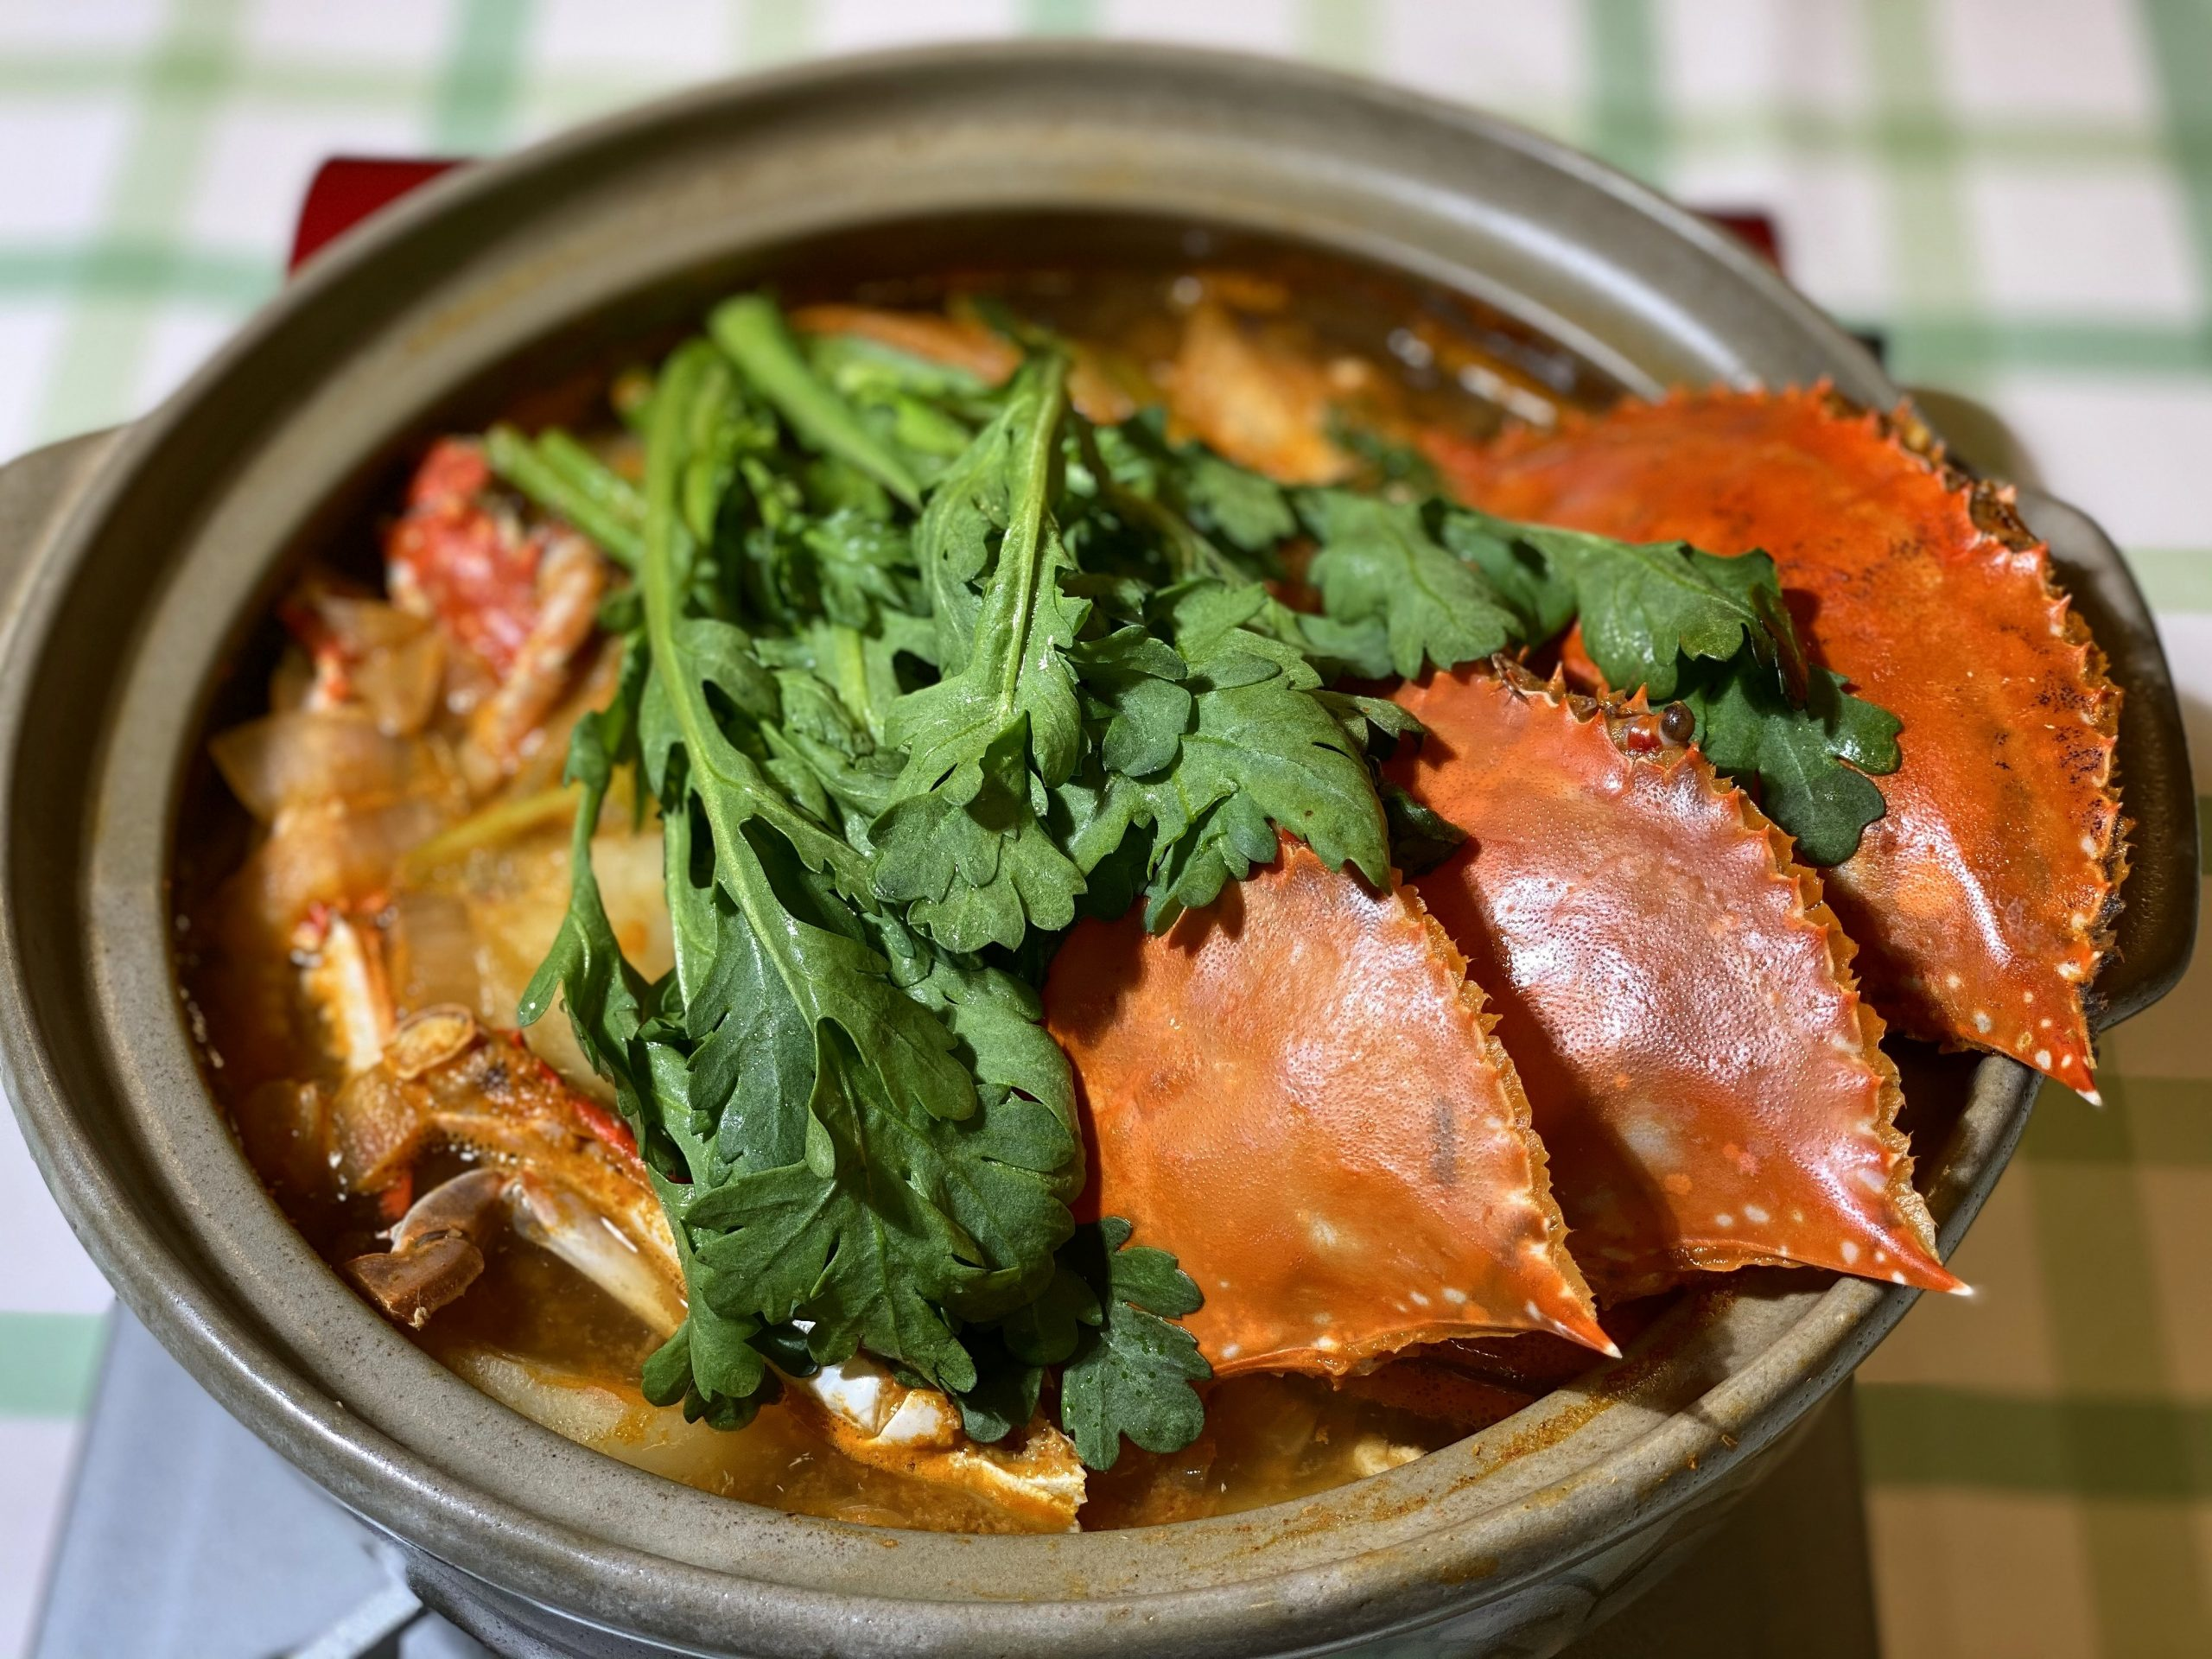 Olive家の簡単レシピ | 韓国料理 ワタリガニの旨味たっぷり ワタリガニの作り方・食べ方 | ワタリガニ鍋 (감자꽃게탕)